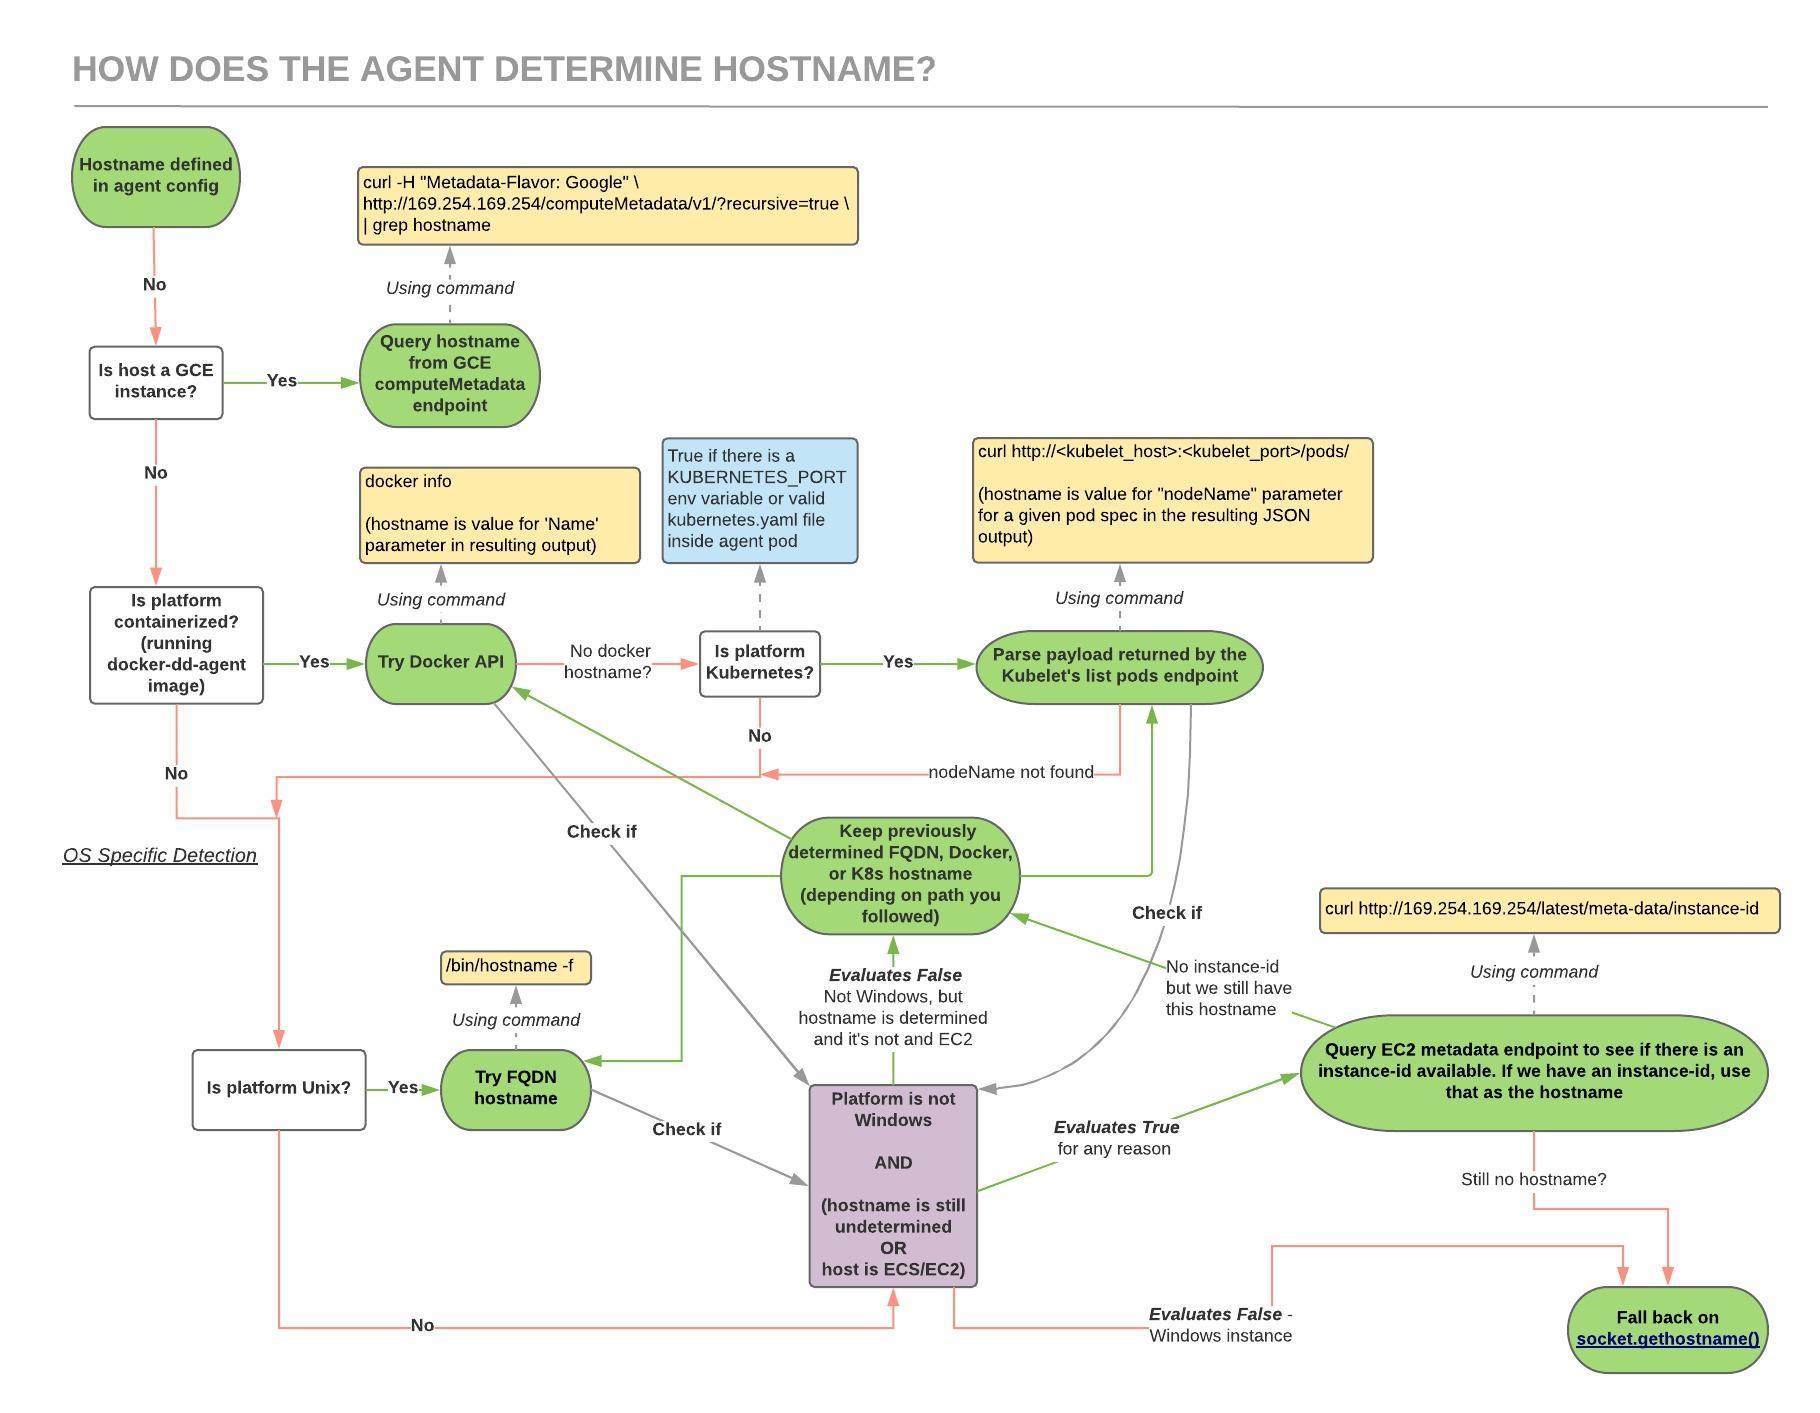 How does Datadog determine the Agent hostname?